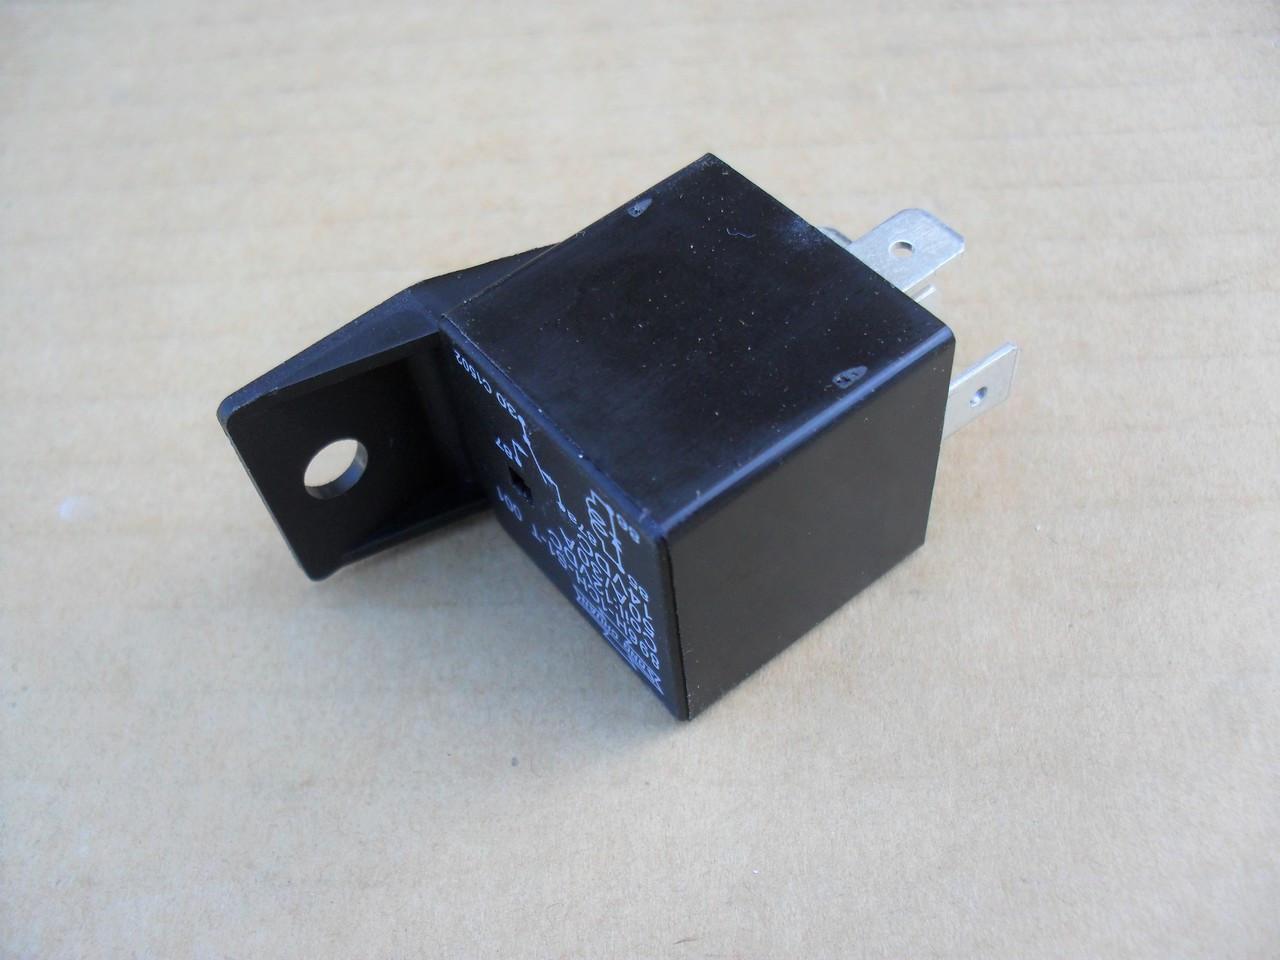 Starter Relay for Ariens EZR1440, EZR1540, EZR1640, EZR1648, EZR1742, 00432100, 00432101, 03042800